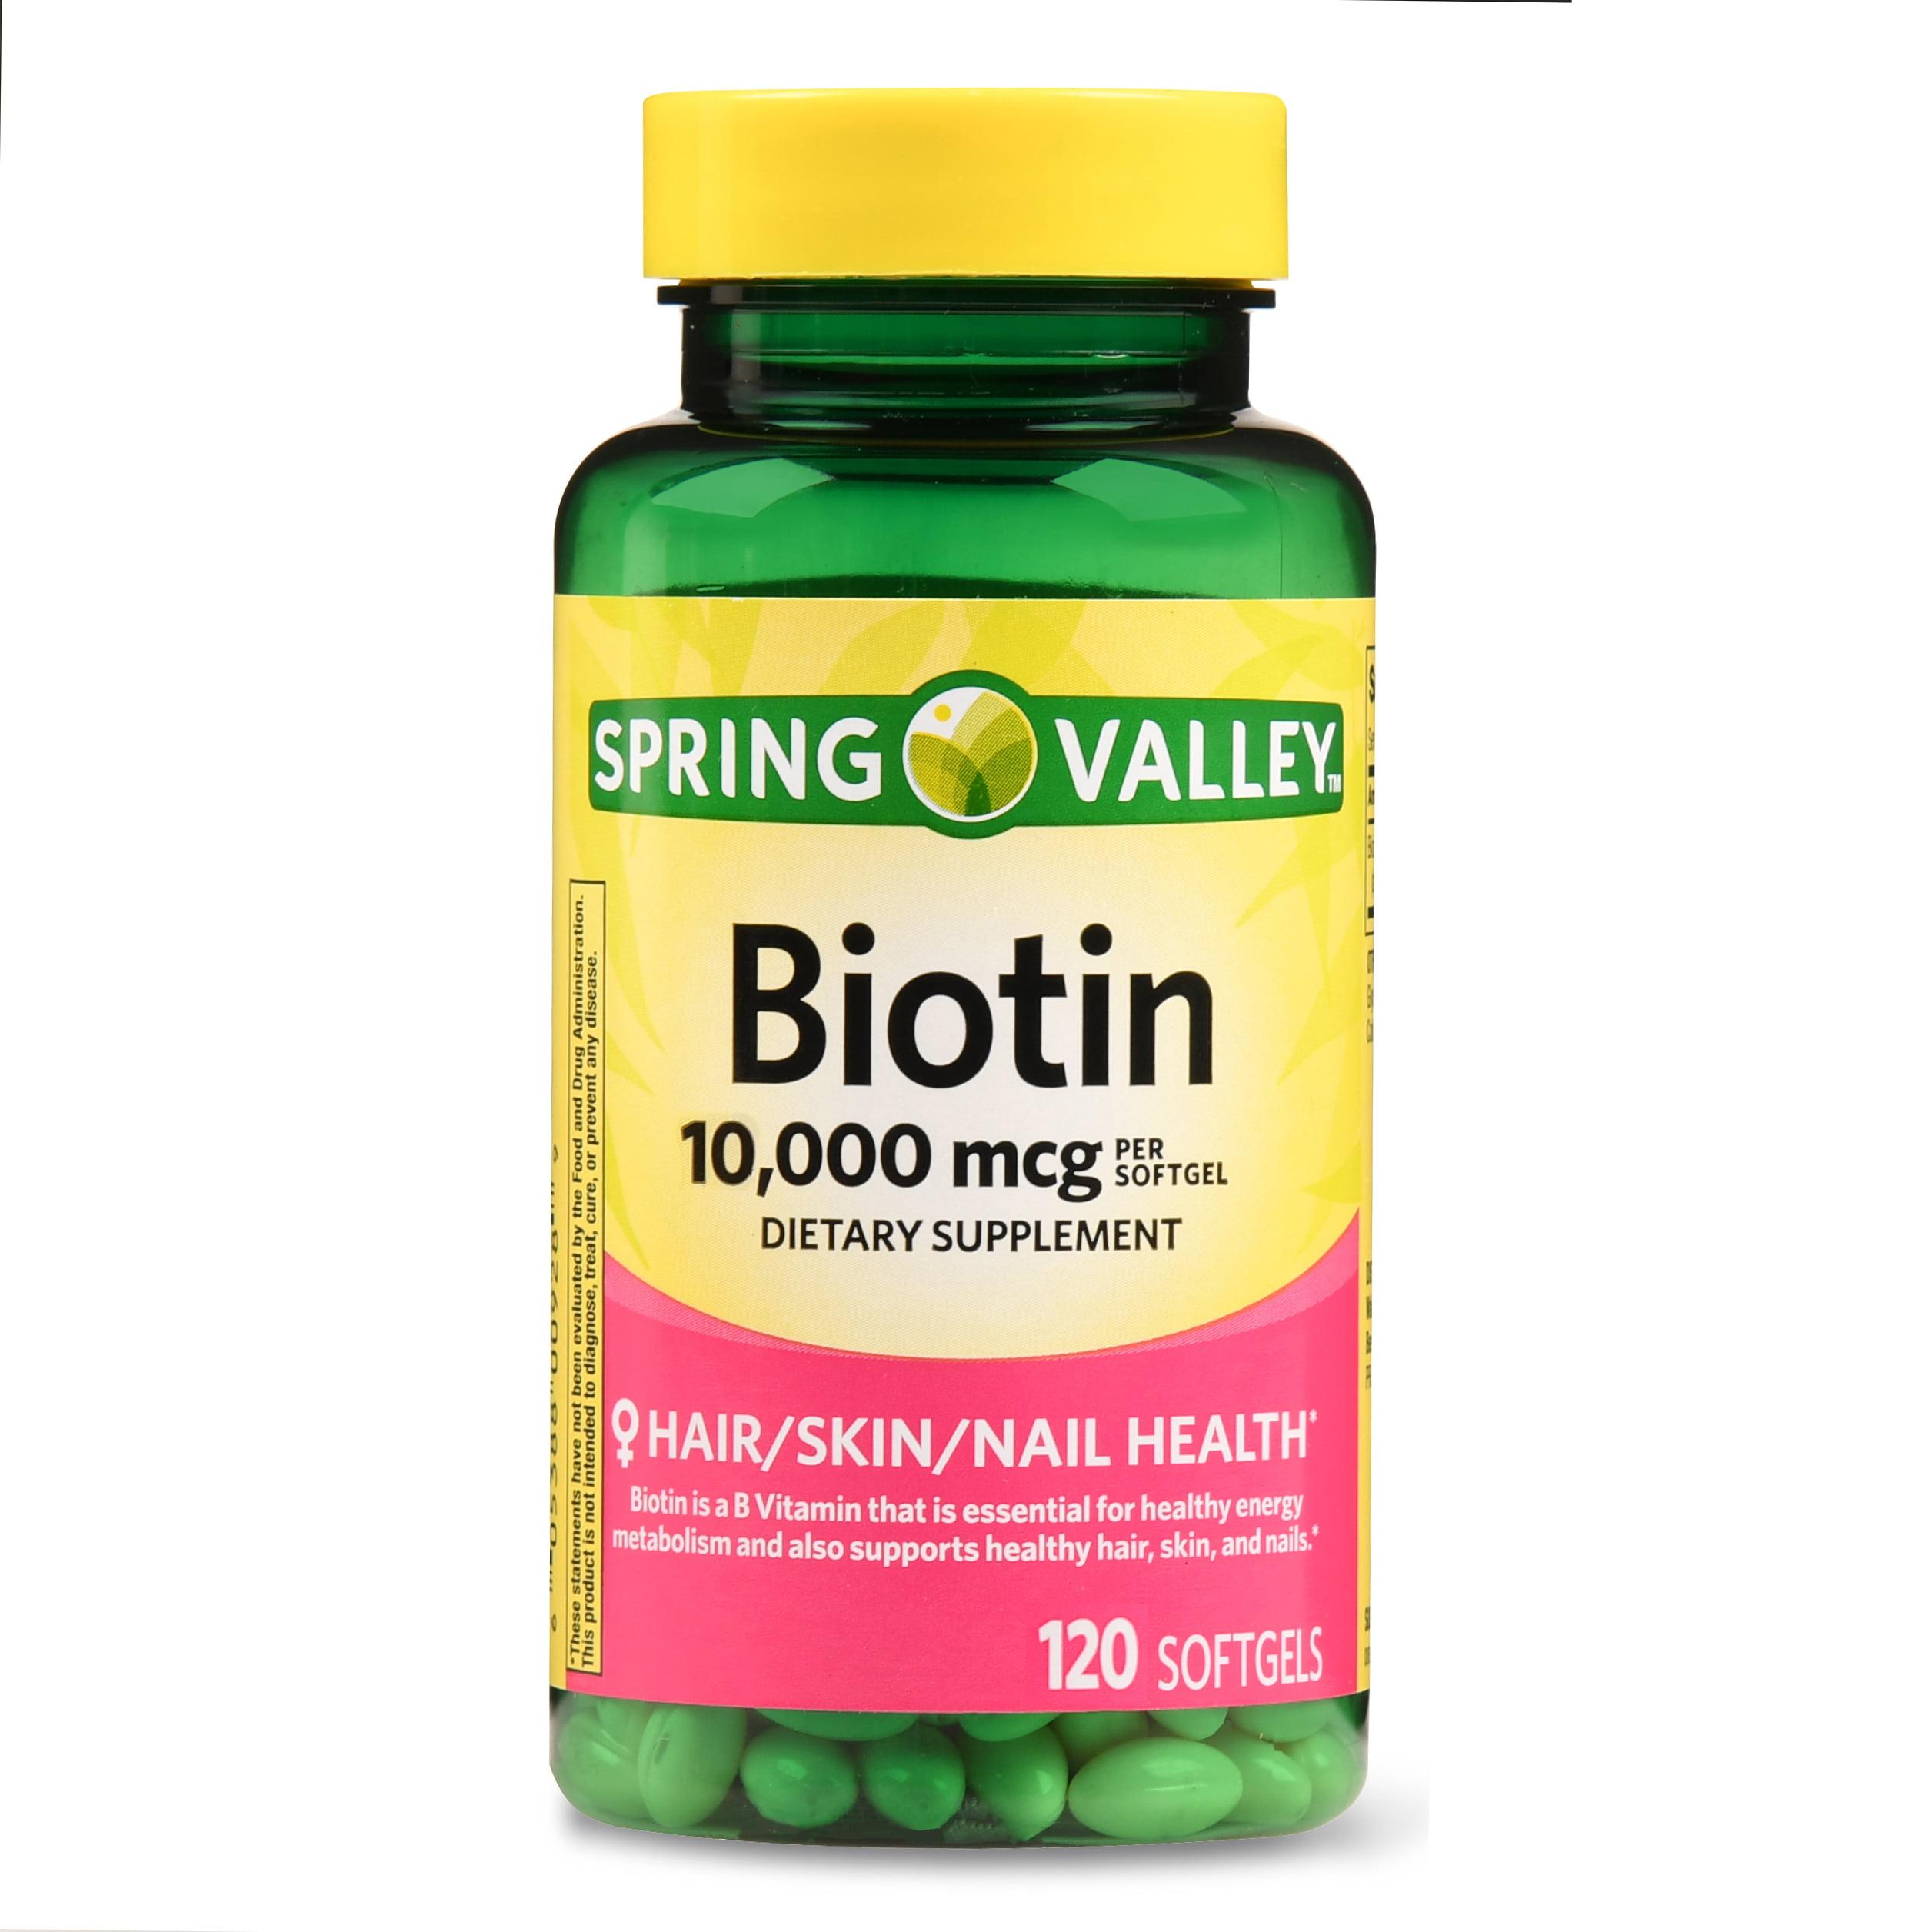 Spring Valley Biotin Softgels, 10000 mcg, 120 Ct